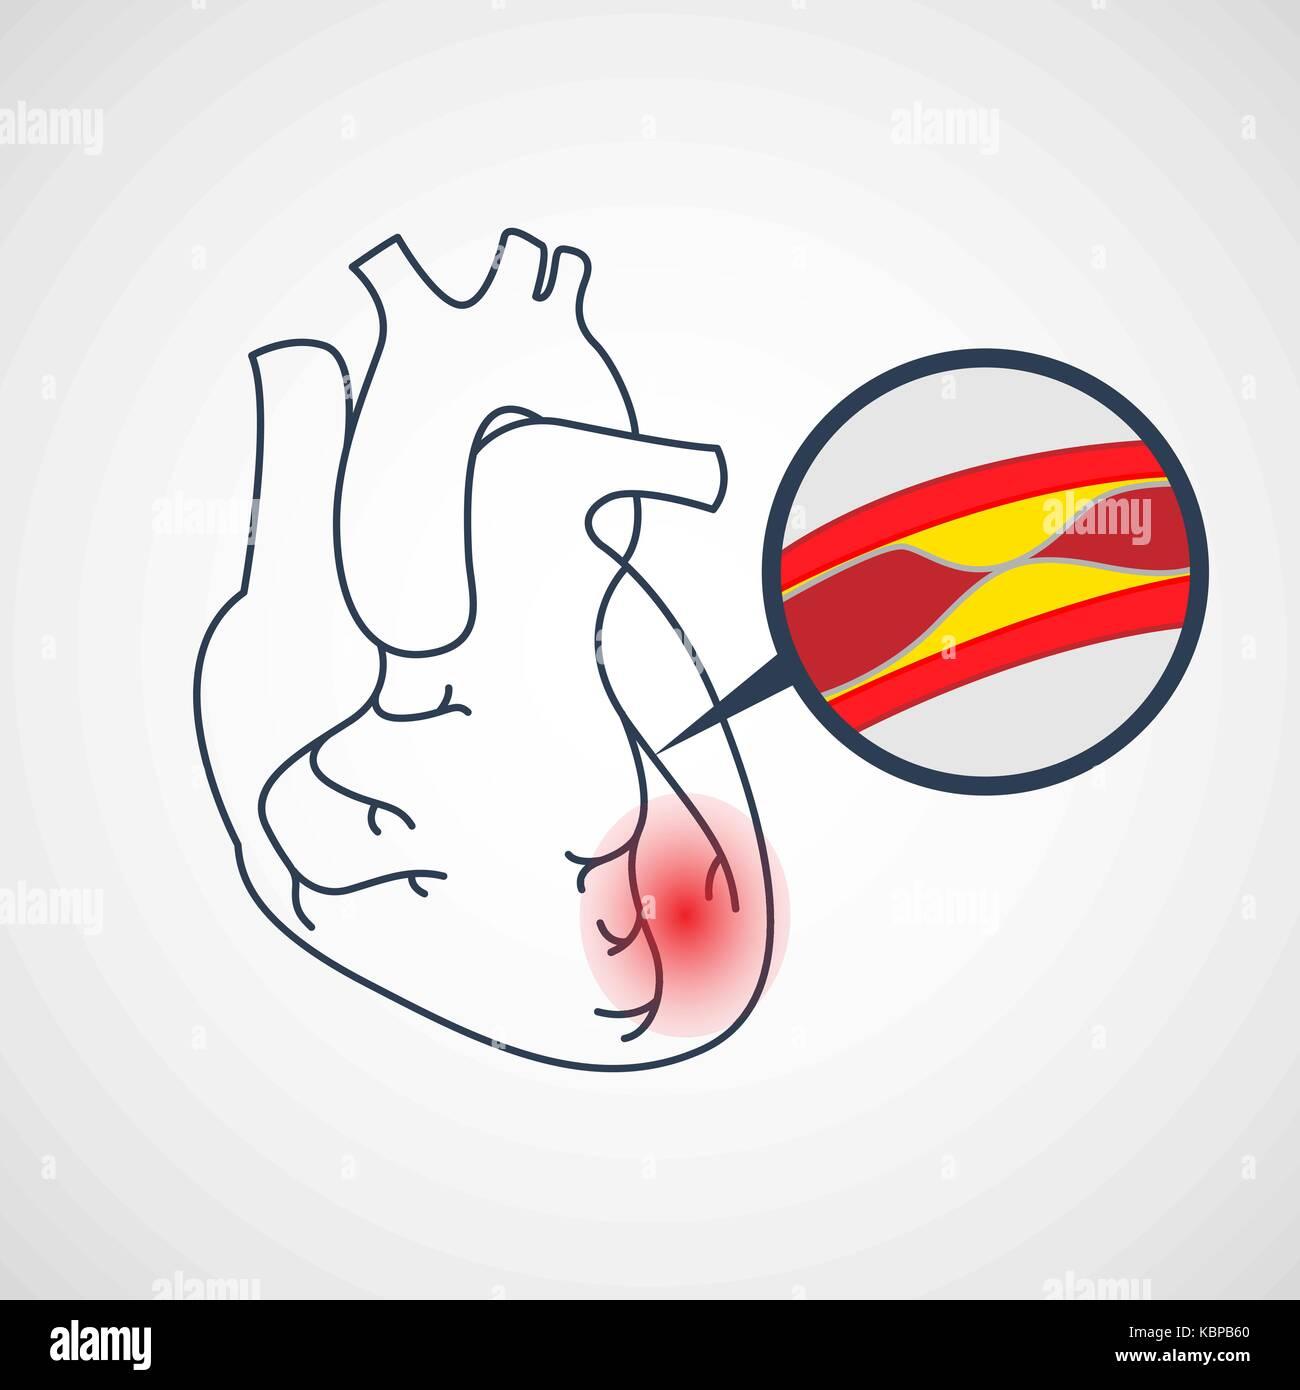 Coronary Artery Disease vector icon illustration - Stock Image